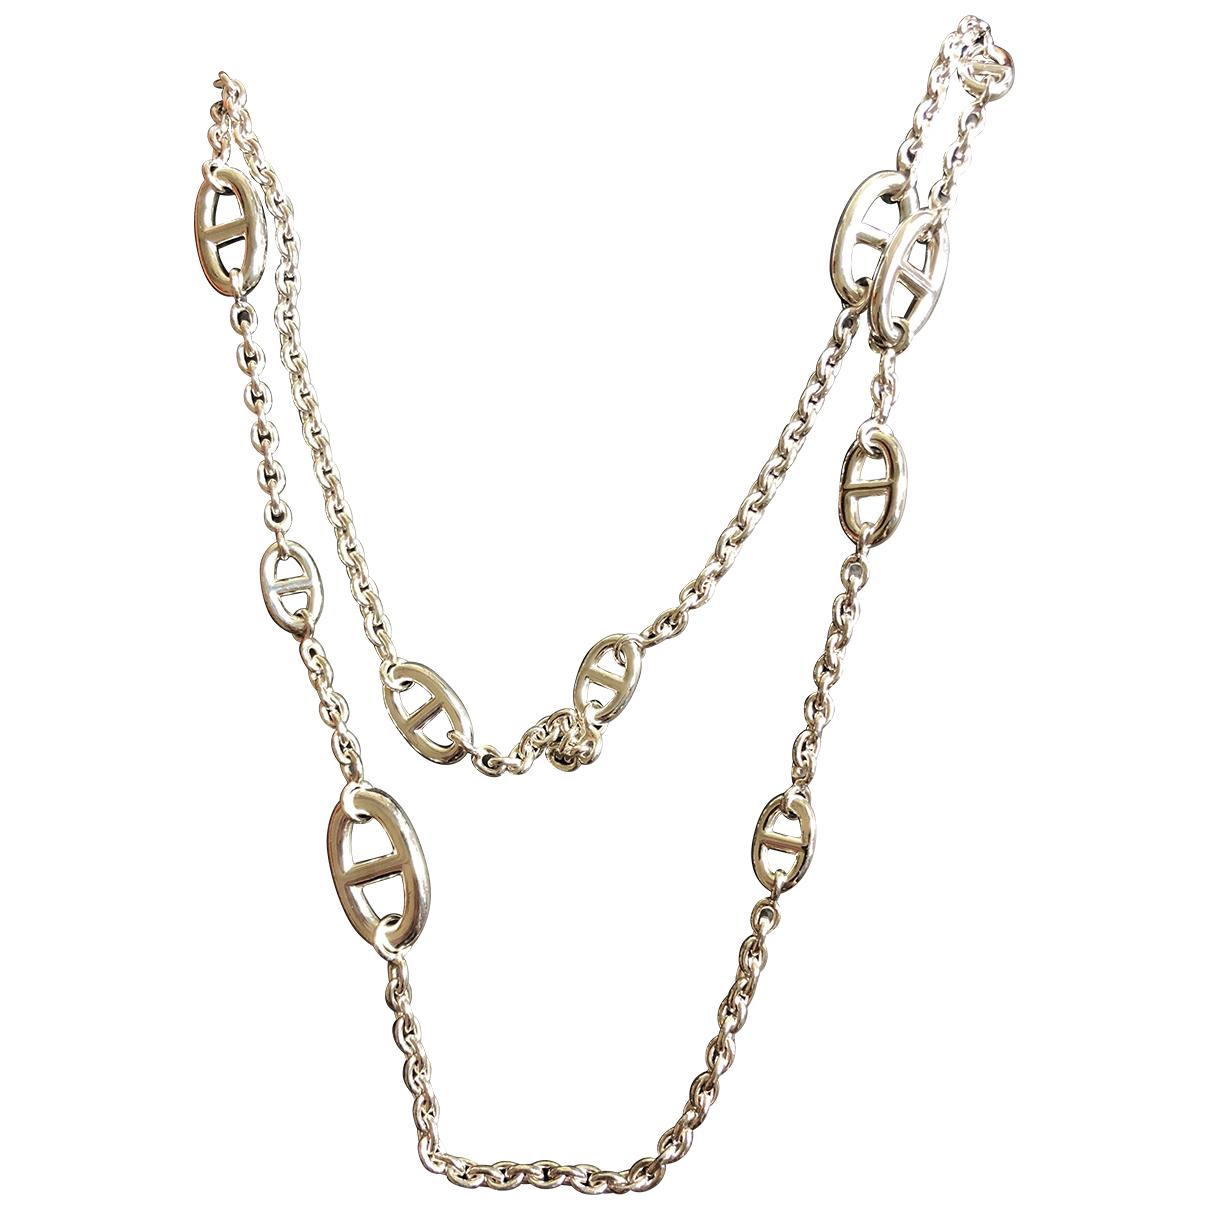 Hermes Farandole Kette in  Silber Silber